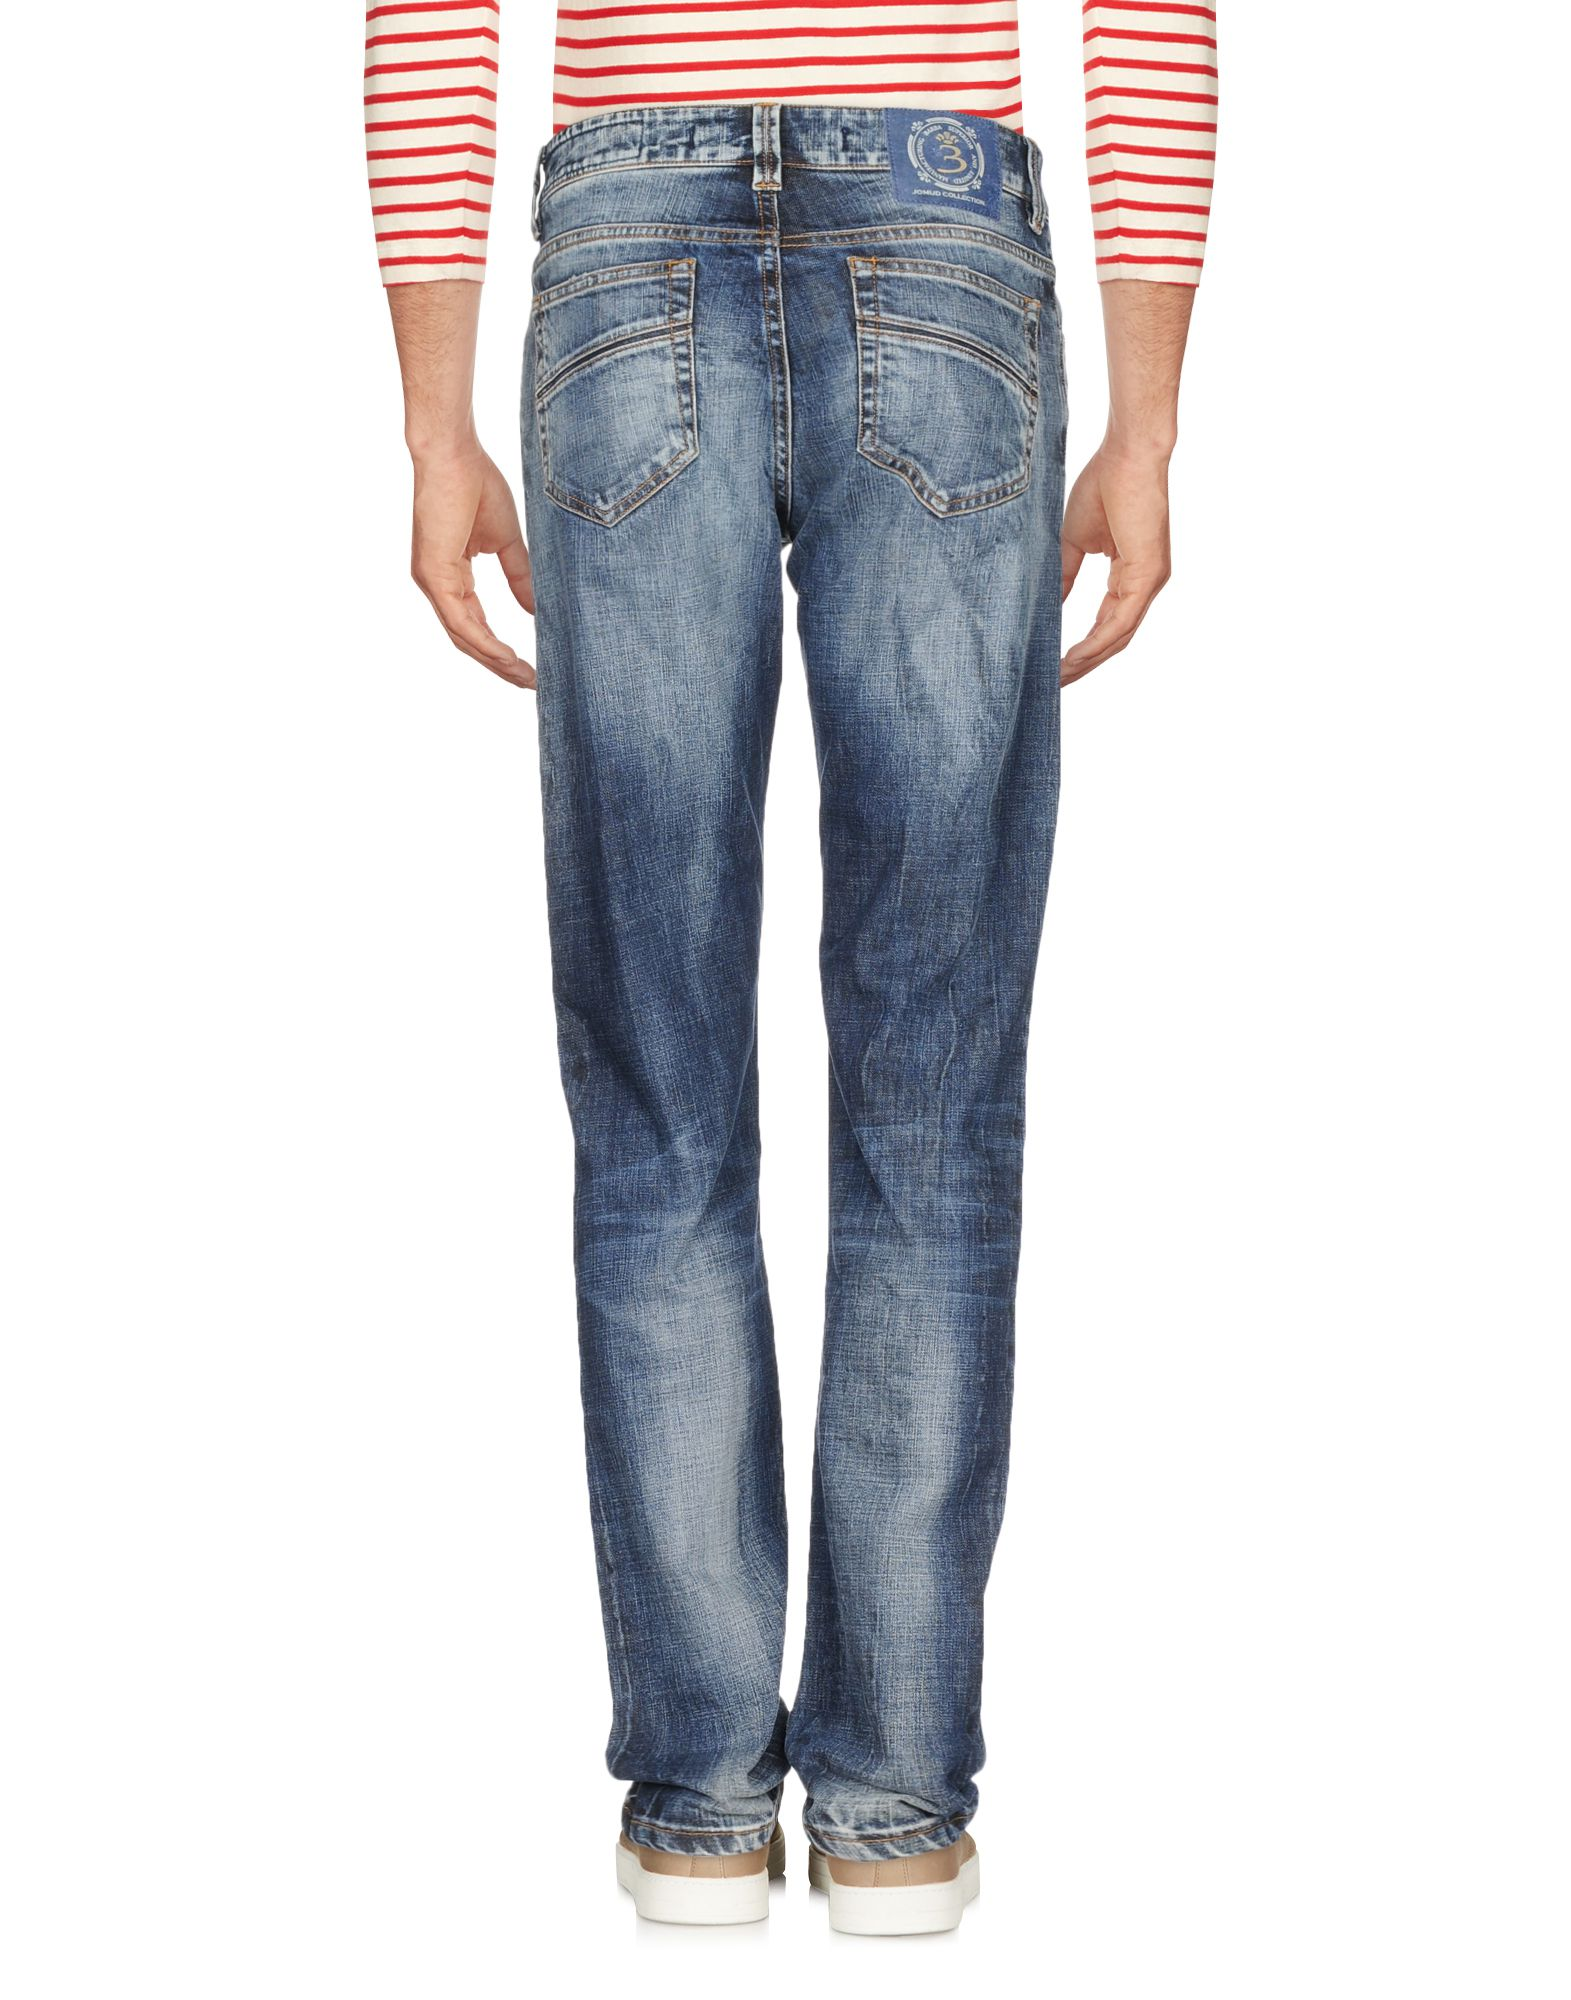 Pantaloni Uomo Jeans Barba Napoli Uomo Pantaloni - 42662248GA 8a042c